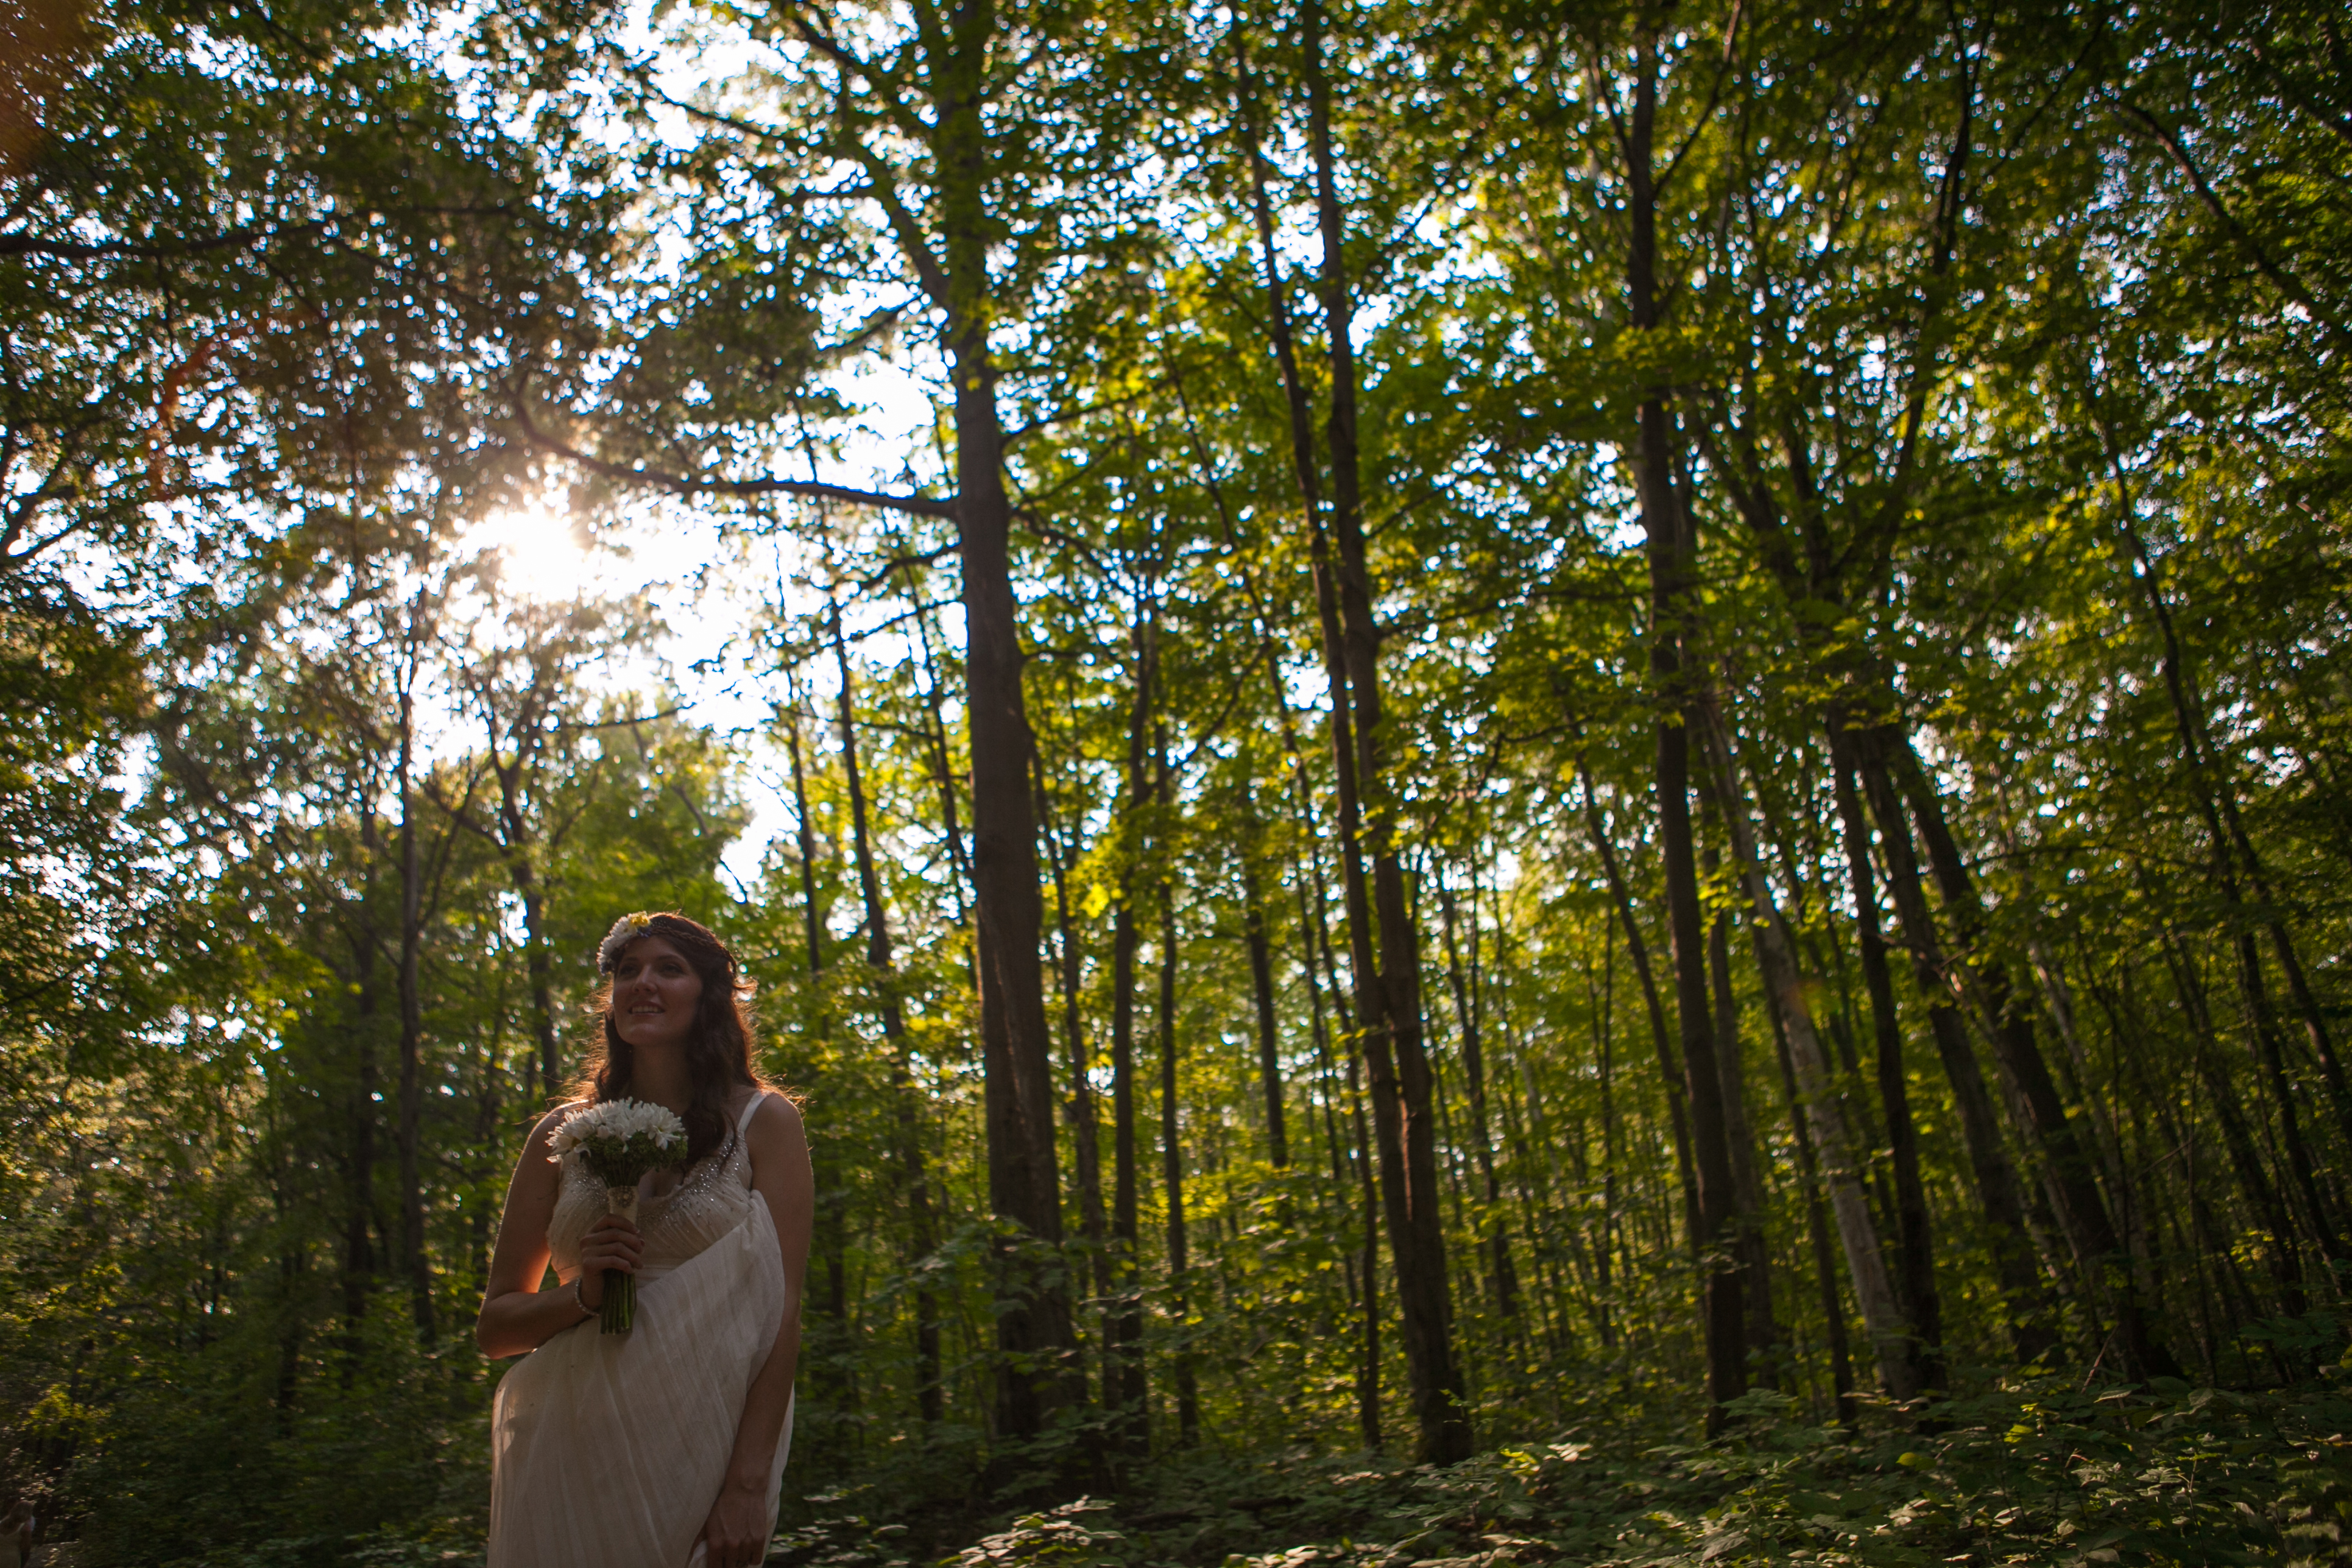 Romantic Forest Weddings Kate Hood Muskoka Toronto Wedding And Boudoir Photographer